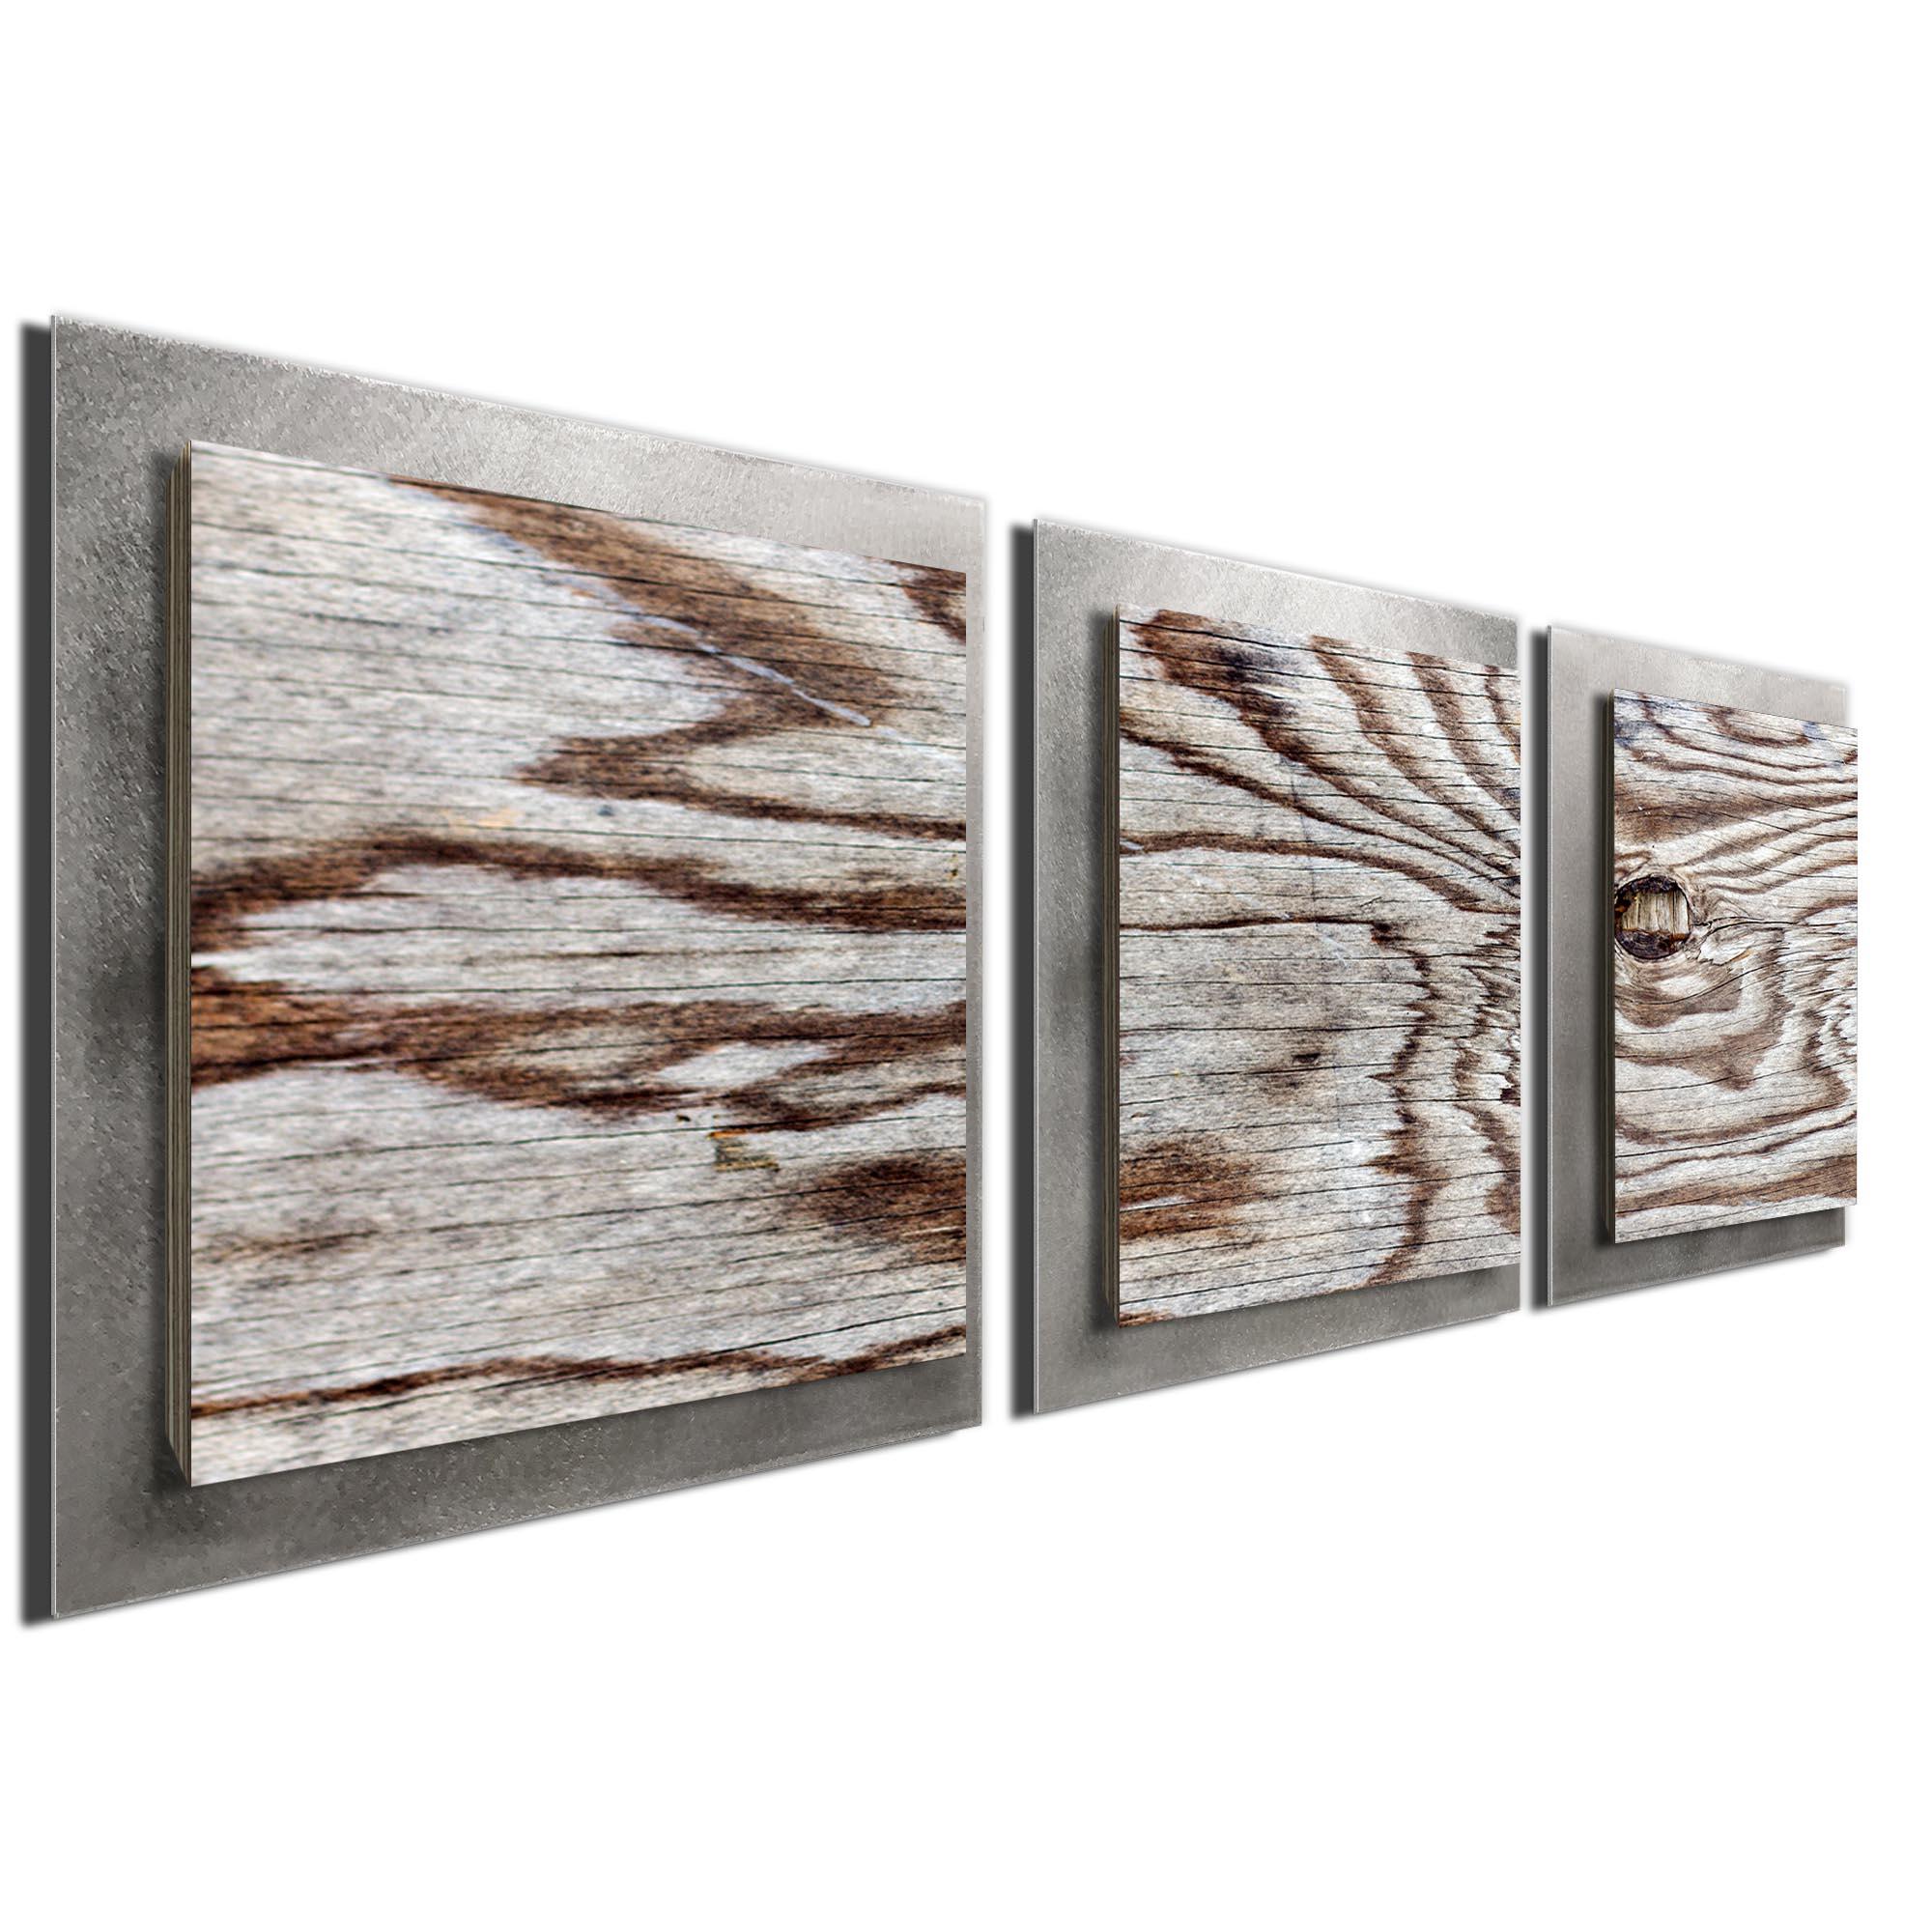 Weathered Wood Essence Silver by Adam Schwoeppe Rustic Modern Style Wood Wall Art - Image 2